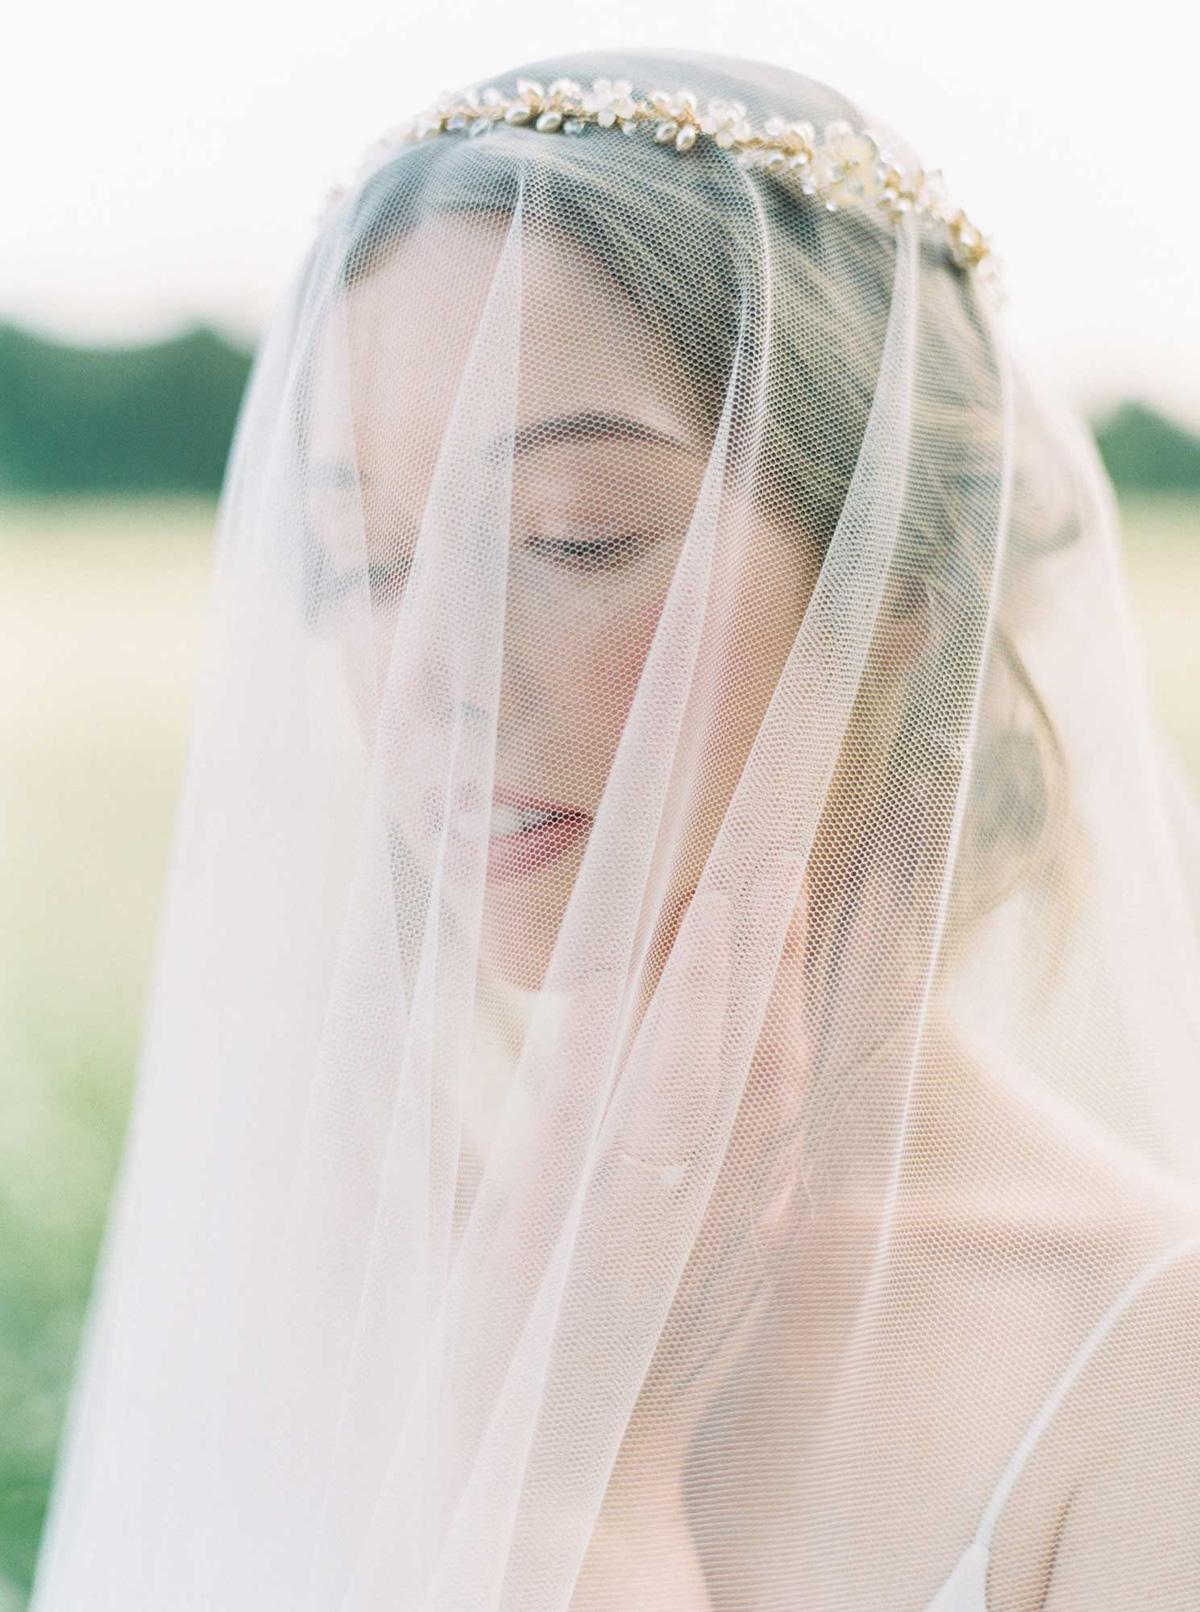 kayla-yestal-vineyard-bride-swish-list-woodland-weddings-niagara-wedding-editorial-22.jpg